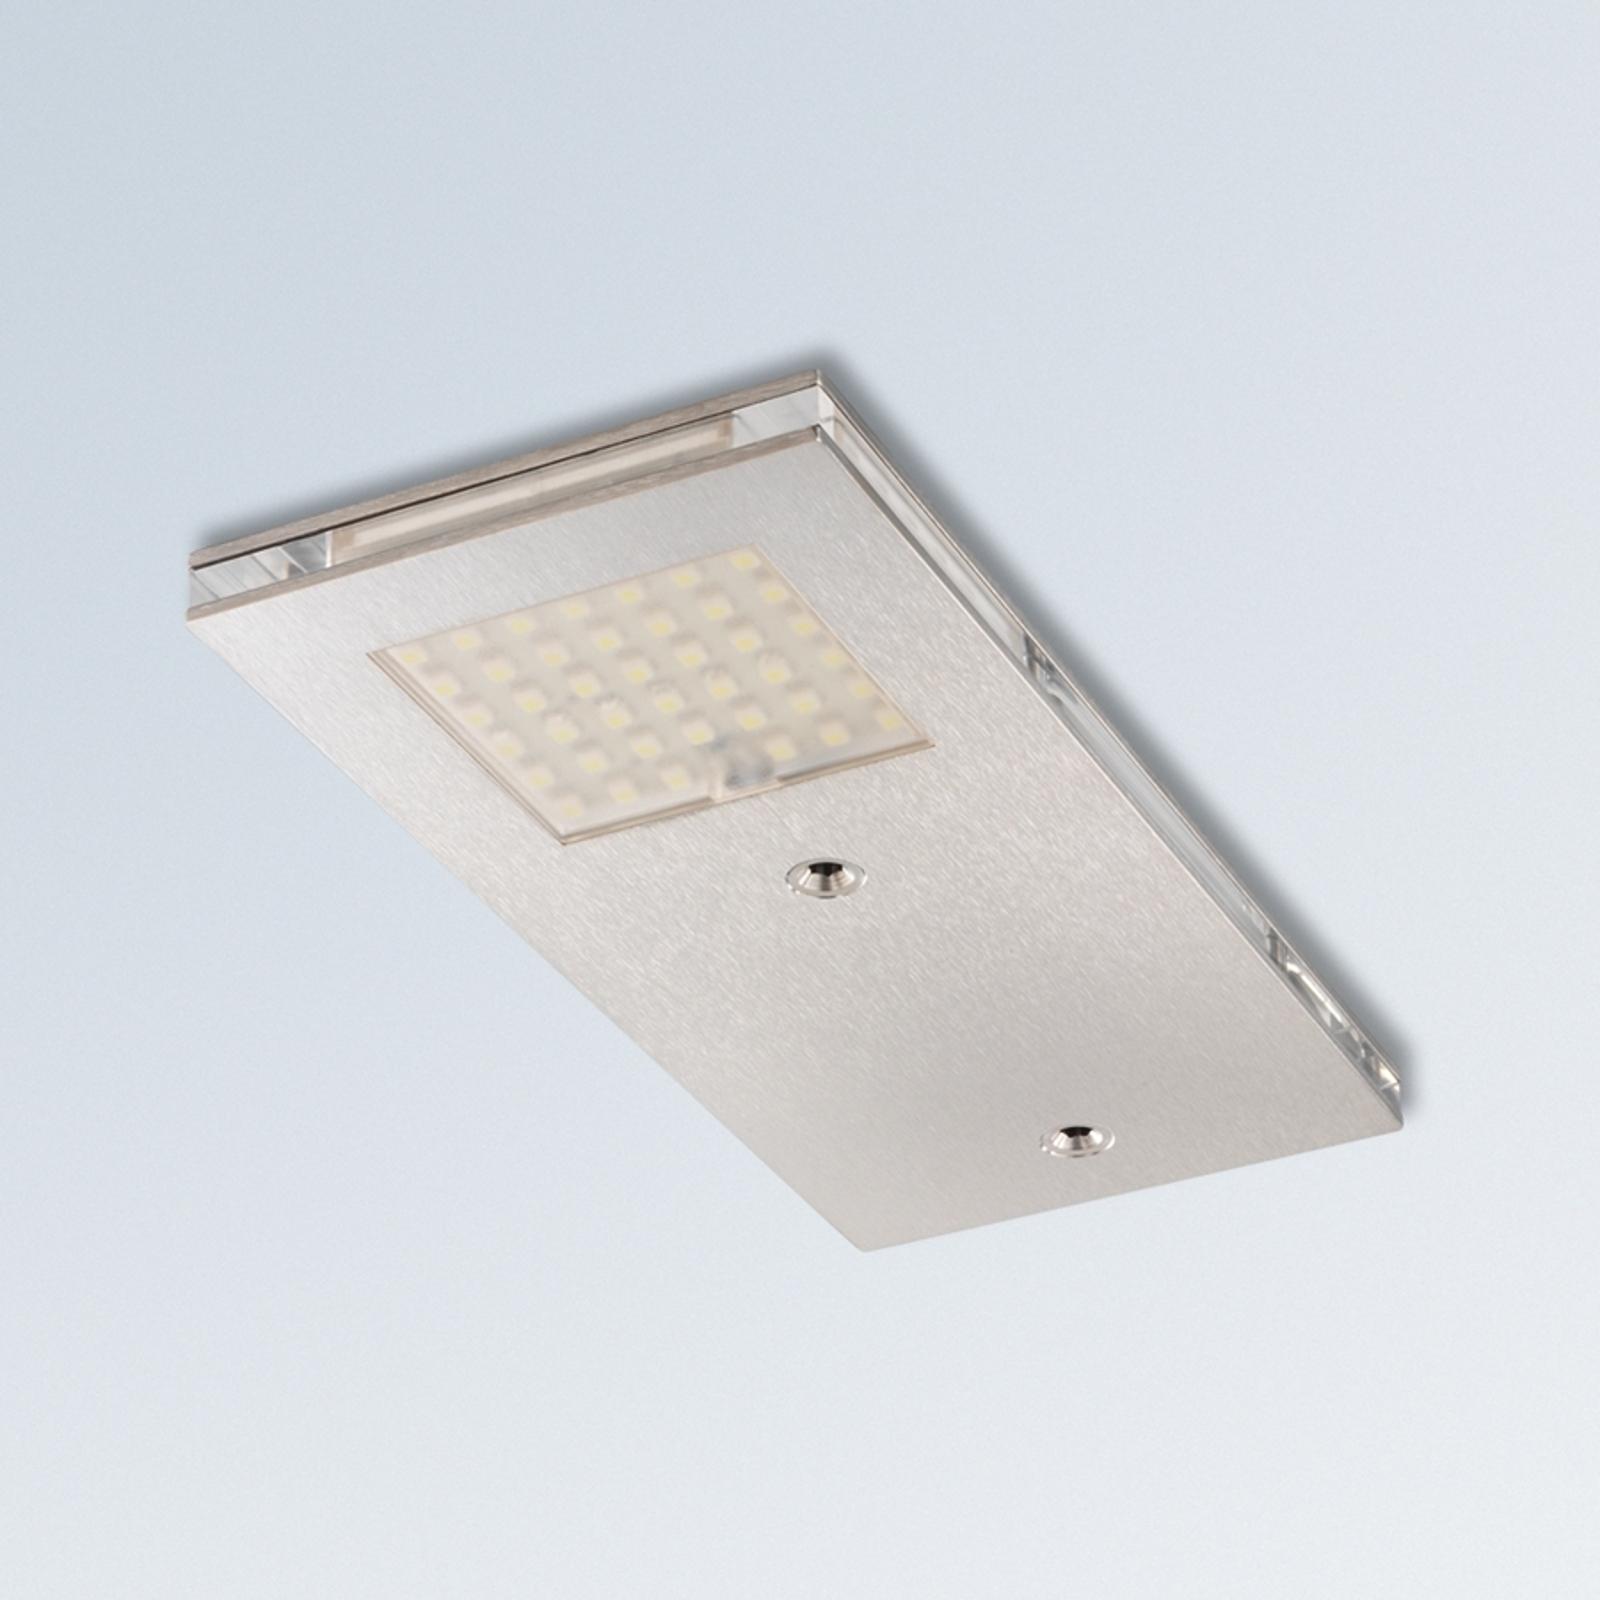 Nowoczesna oprawa podszafkowa LED FLAT I